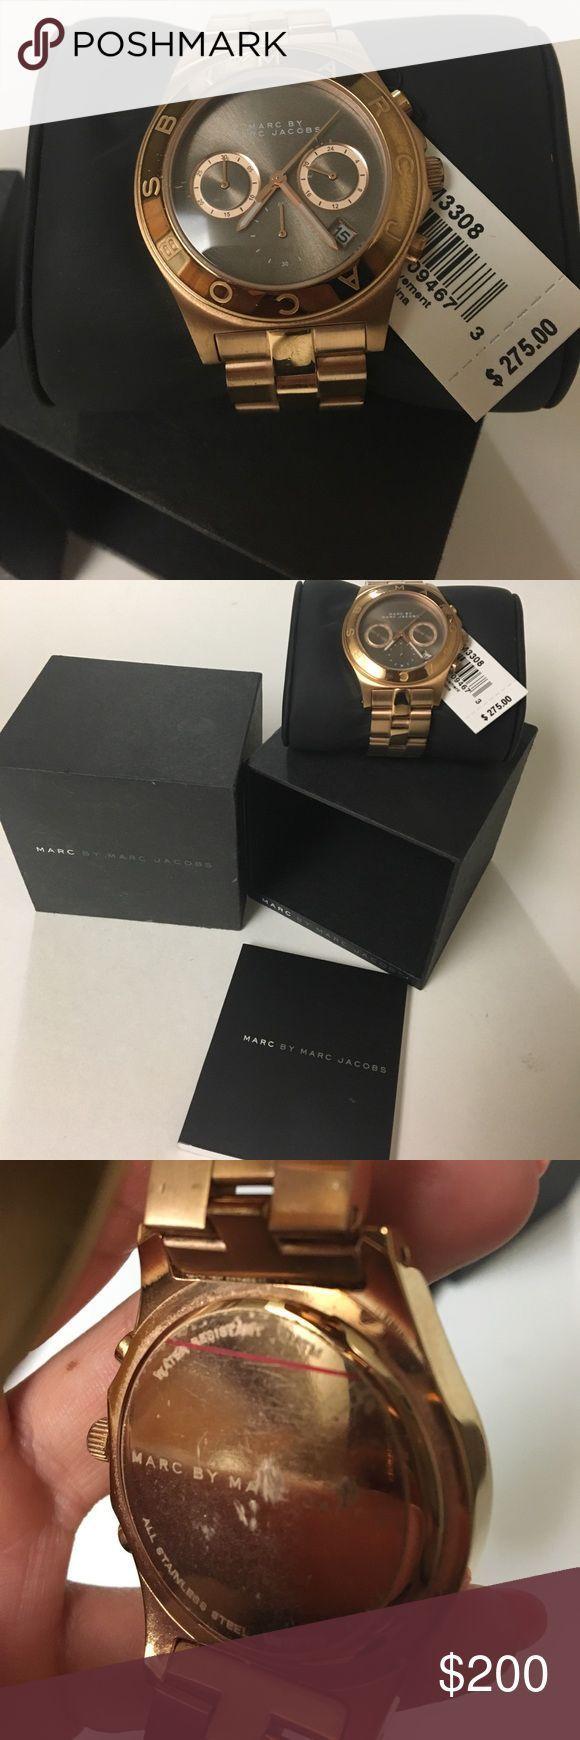 Montre pour femme : Marc Jacobs Rose Gold Women's Watch MINT CONDITION. With original Tags orig